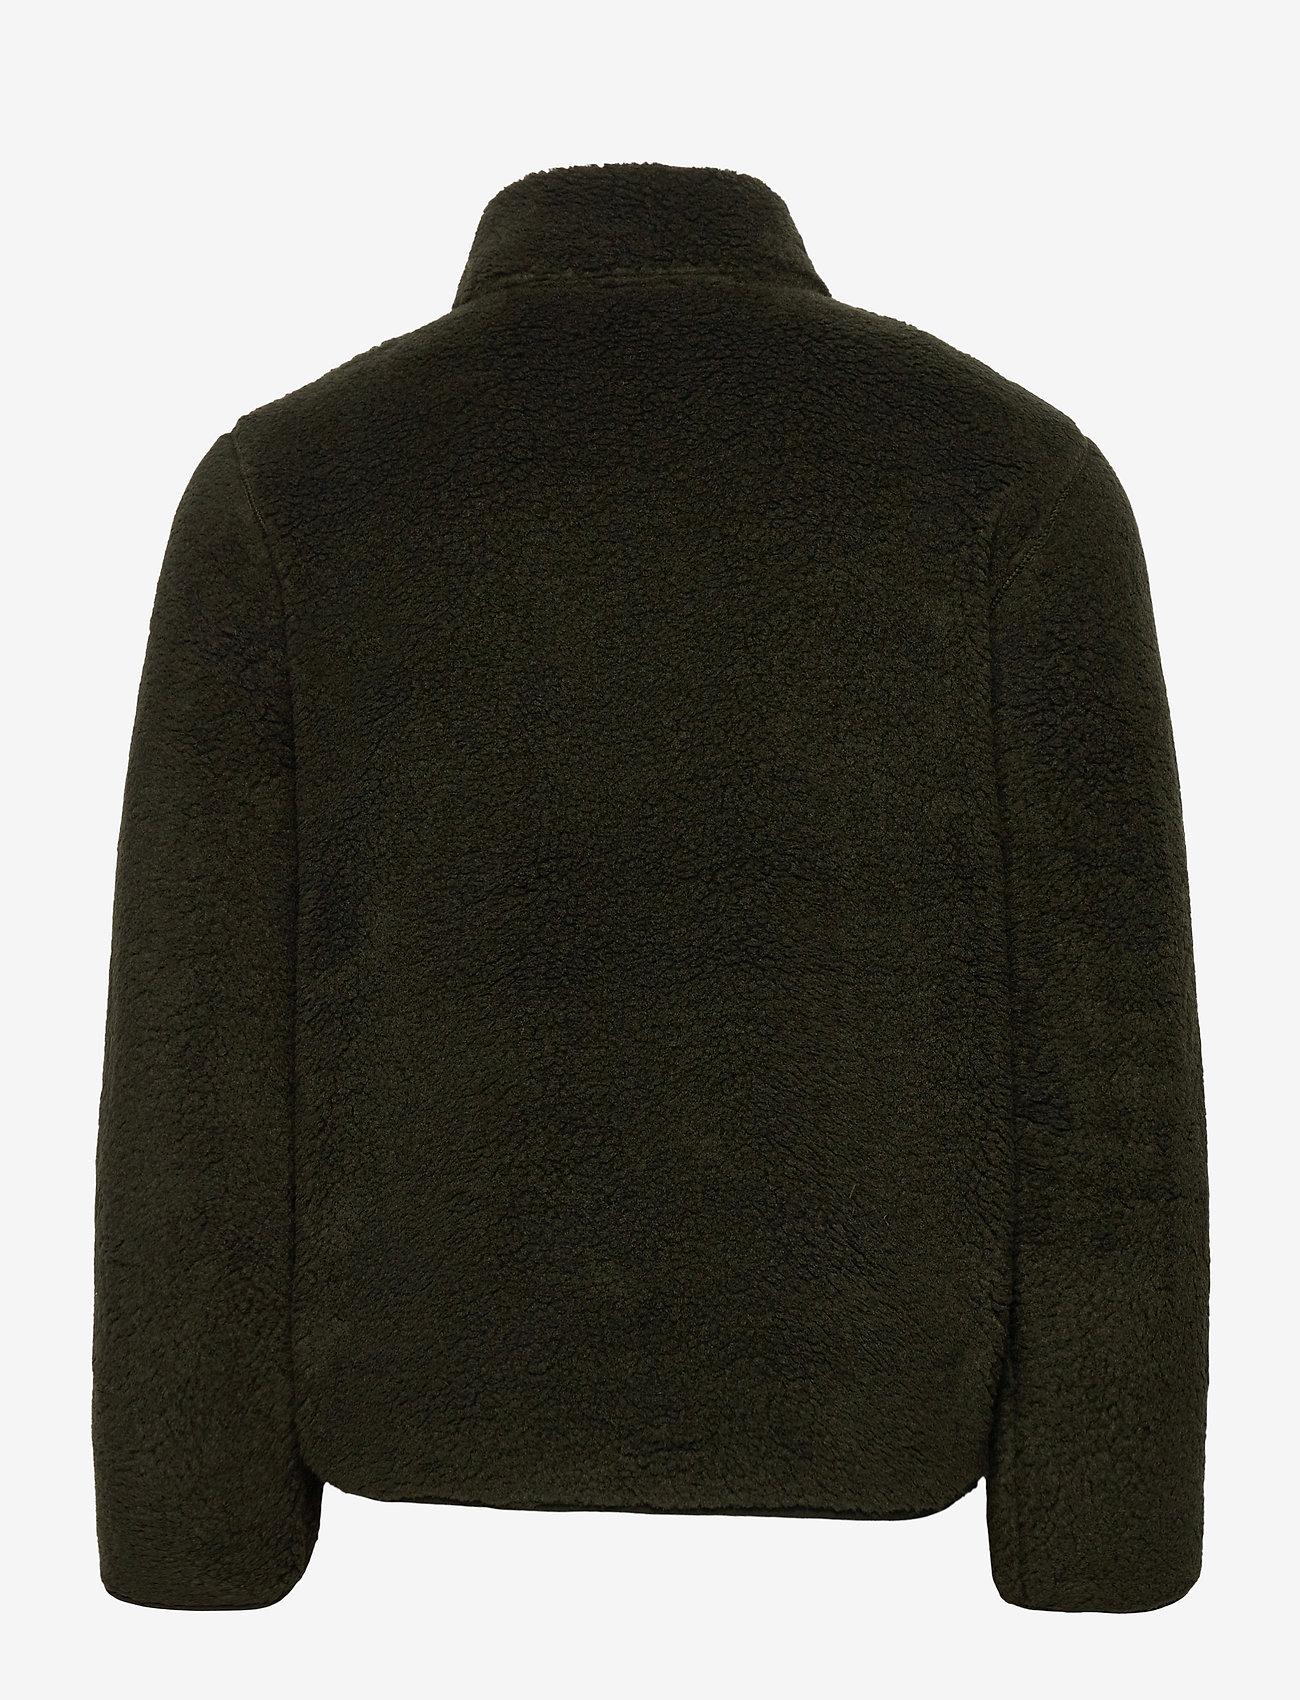 Knowledge Cotton Apparel - ELM zip teddy fleece sweat - Vegan - basic-sweatshirts - forrest night - 1